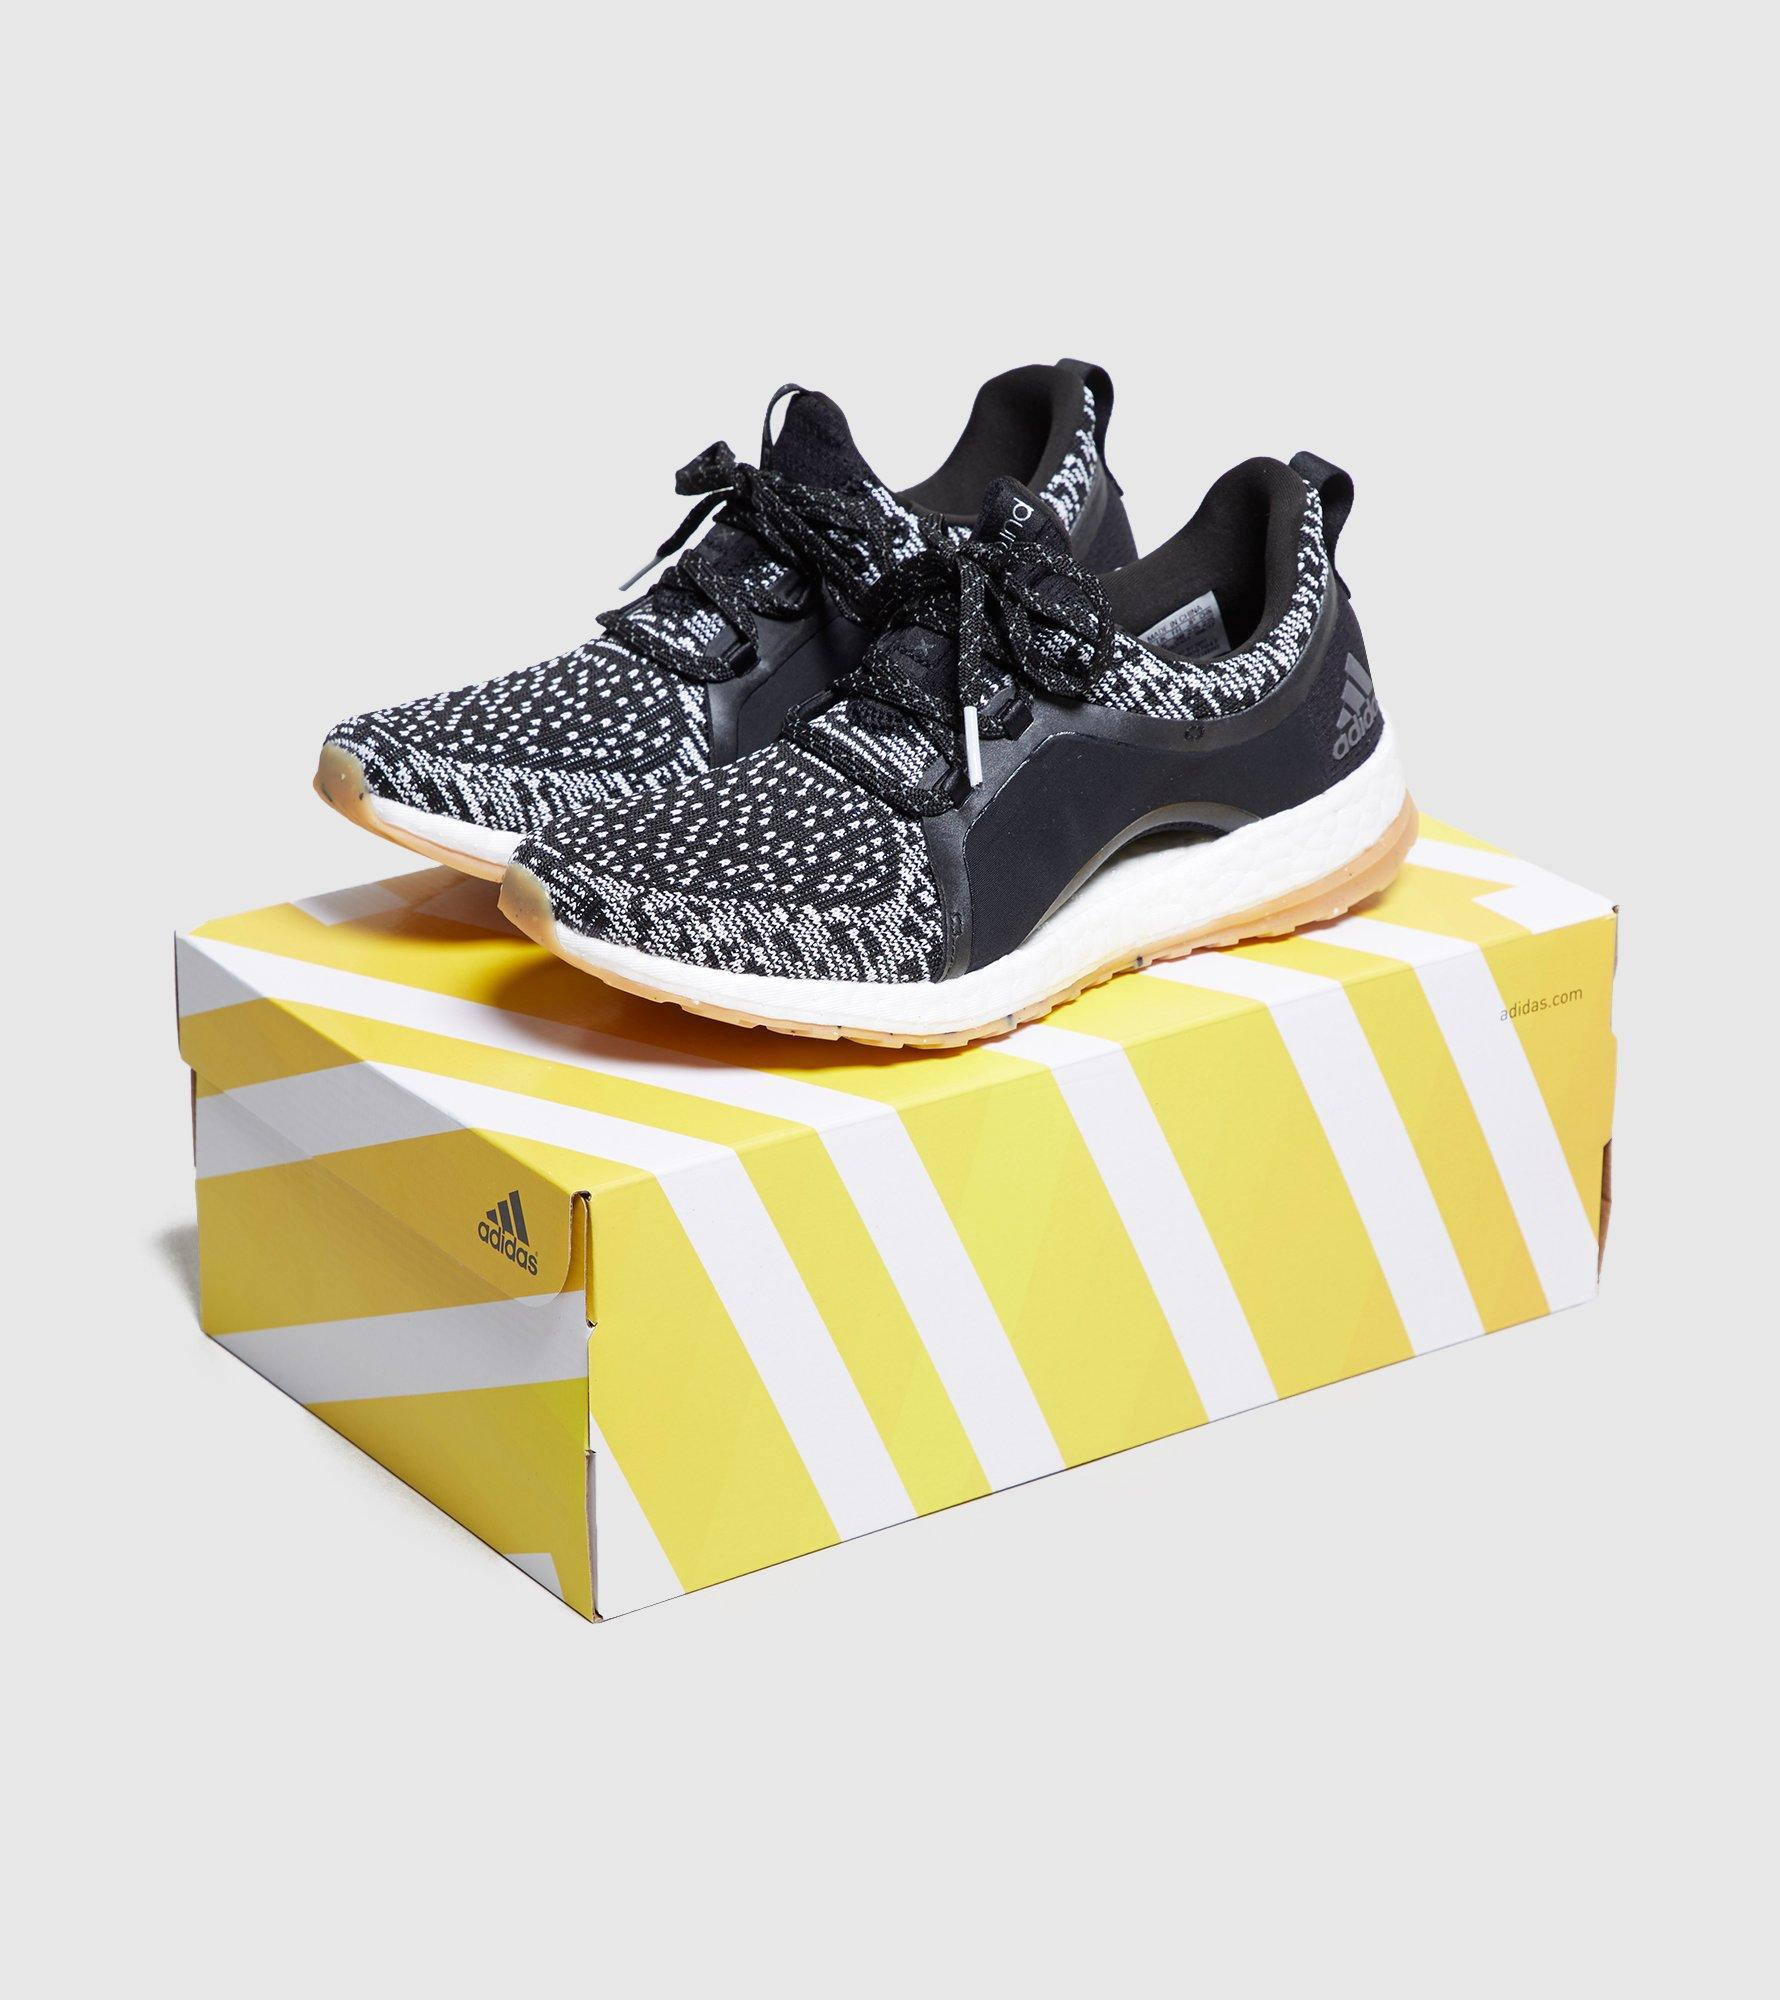 b4761c98b ... cheapest lyst adidas pure boost all terrain womens in black 5fb20 3814b